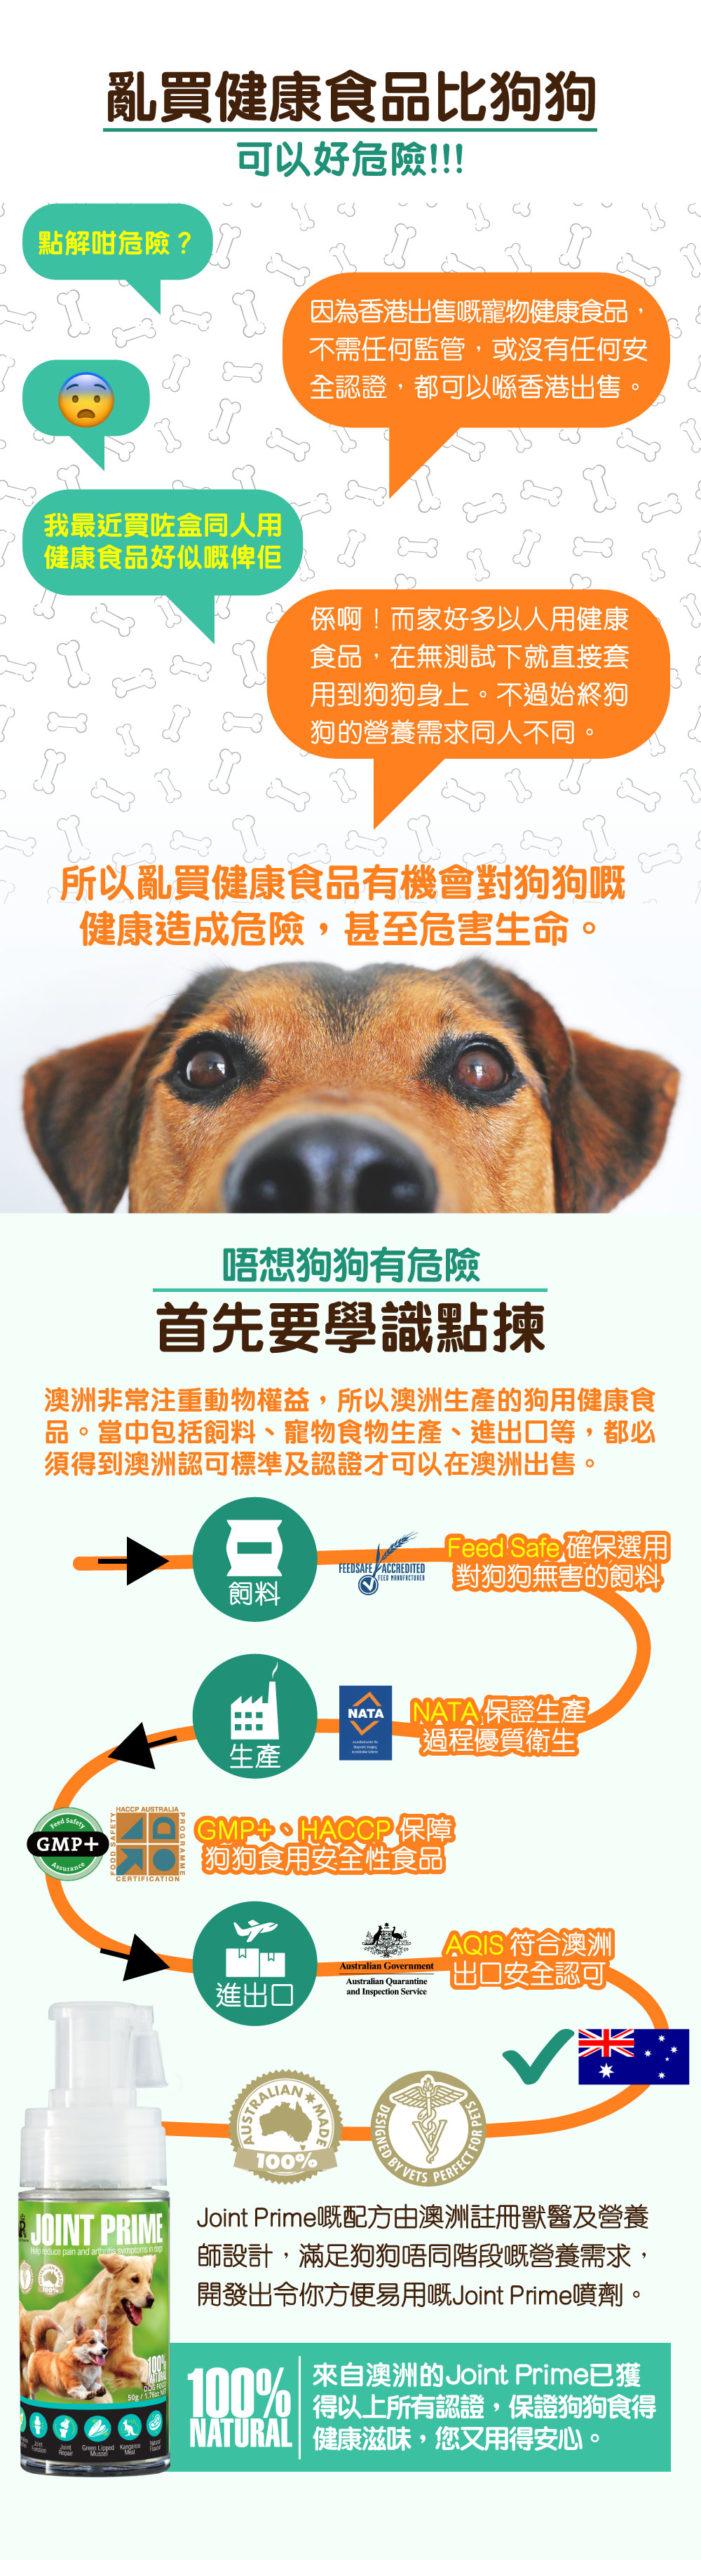 Pet Pet Premier, Joint Prime, Health Prime, 狗狗神仙粉, 关节神仙粉, 狗保健品 | 乱买健康食品比狗狗 可以好危险!!! 点解咁危险? 因为好多国家和地区出售嘅宠物健康食品,不需任何监管,或没有任何安全认证,都可以喺香港出售。 我最近买咗盒同人用健康食品好似嘅俾佢 系啊!而家好多以人用健康食品,在无测试下就直接套用到狗狗身上。不过始终狗狗的营养需求同人不同。 所以乱买健康食品有机会对狗狗嘅健康造成危险,甚至危害生命。 唔想狗狗有危险 首先要学识点拣 澳洲非常注重动物权益,所以澳洲生产的狗用健康食品。当中包括饲料、宠物食物生产、进出口等,都必须得到澳洲认可标准及认证才可以在澳洲出售。 Feed Safe 确保选用对狗狗无害的饲料 NATA 保证生产过程优质卫生 GMP+、HACCP 保障狗狗食用安全性食品 AQIS 符合澳洲出口安全认可 Joint Prime嘅配方由澳洲注册兽医及营养师设计,满足狗狗唔同阶段嘅营养需求,开发出令您方便易用嘅Health Prime喷剂。 来自澳洲的Health Prime已获得以上所有认证,保证狗狗食得健康滋味,您又用得安心。